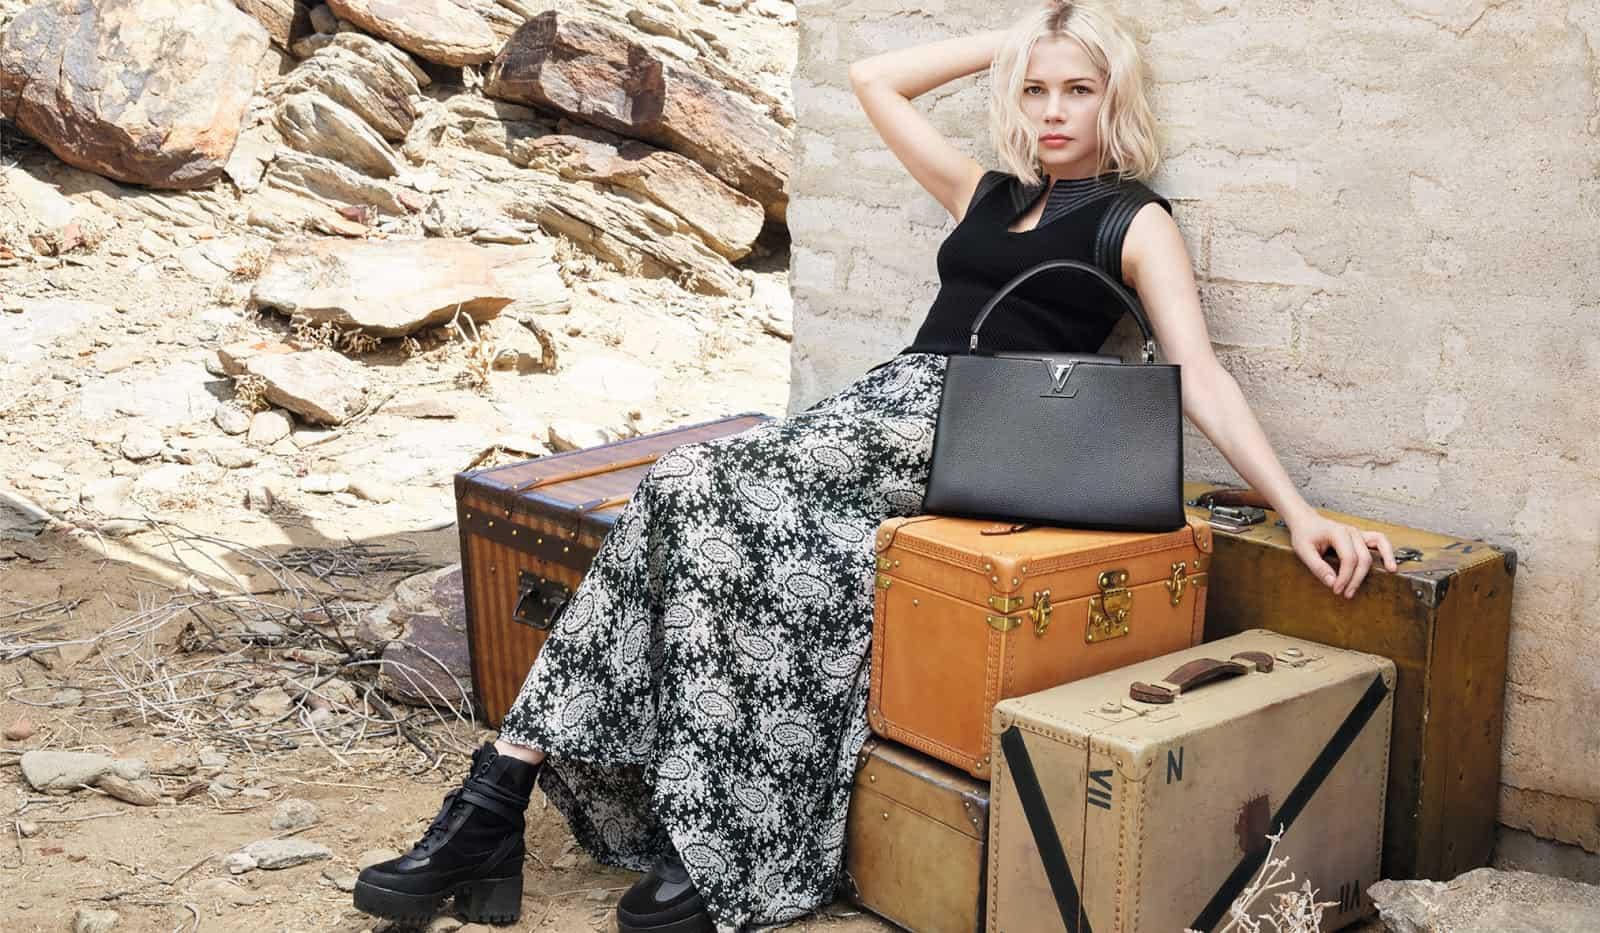 Louis Vuitton Spirit of Travel campaign